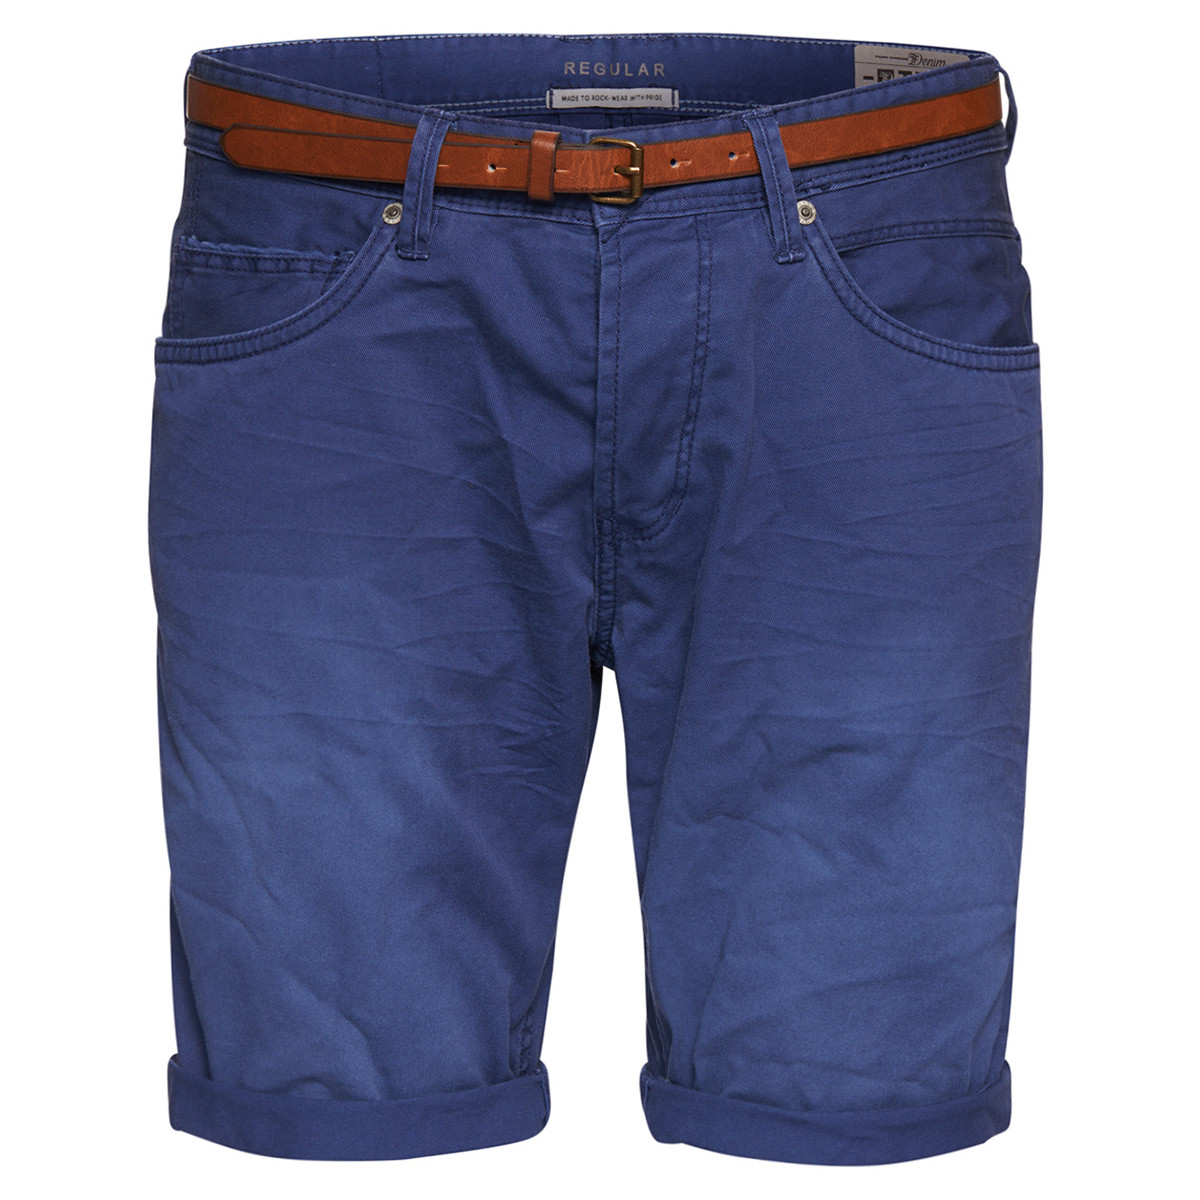 64043430012 Short Homme